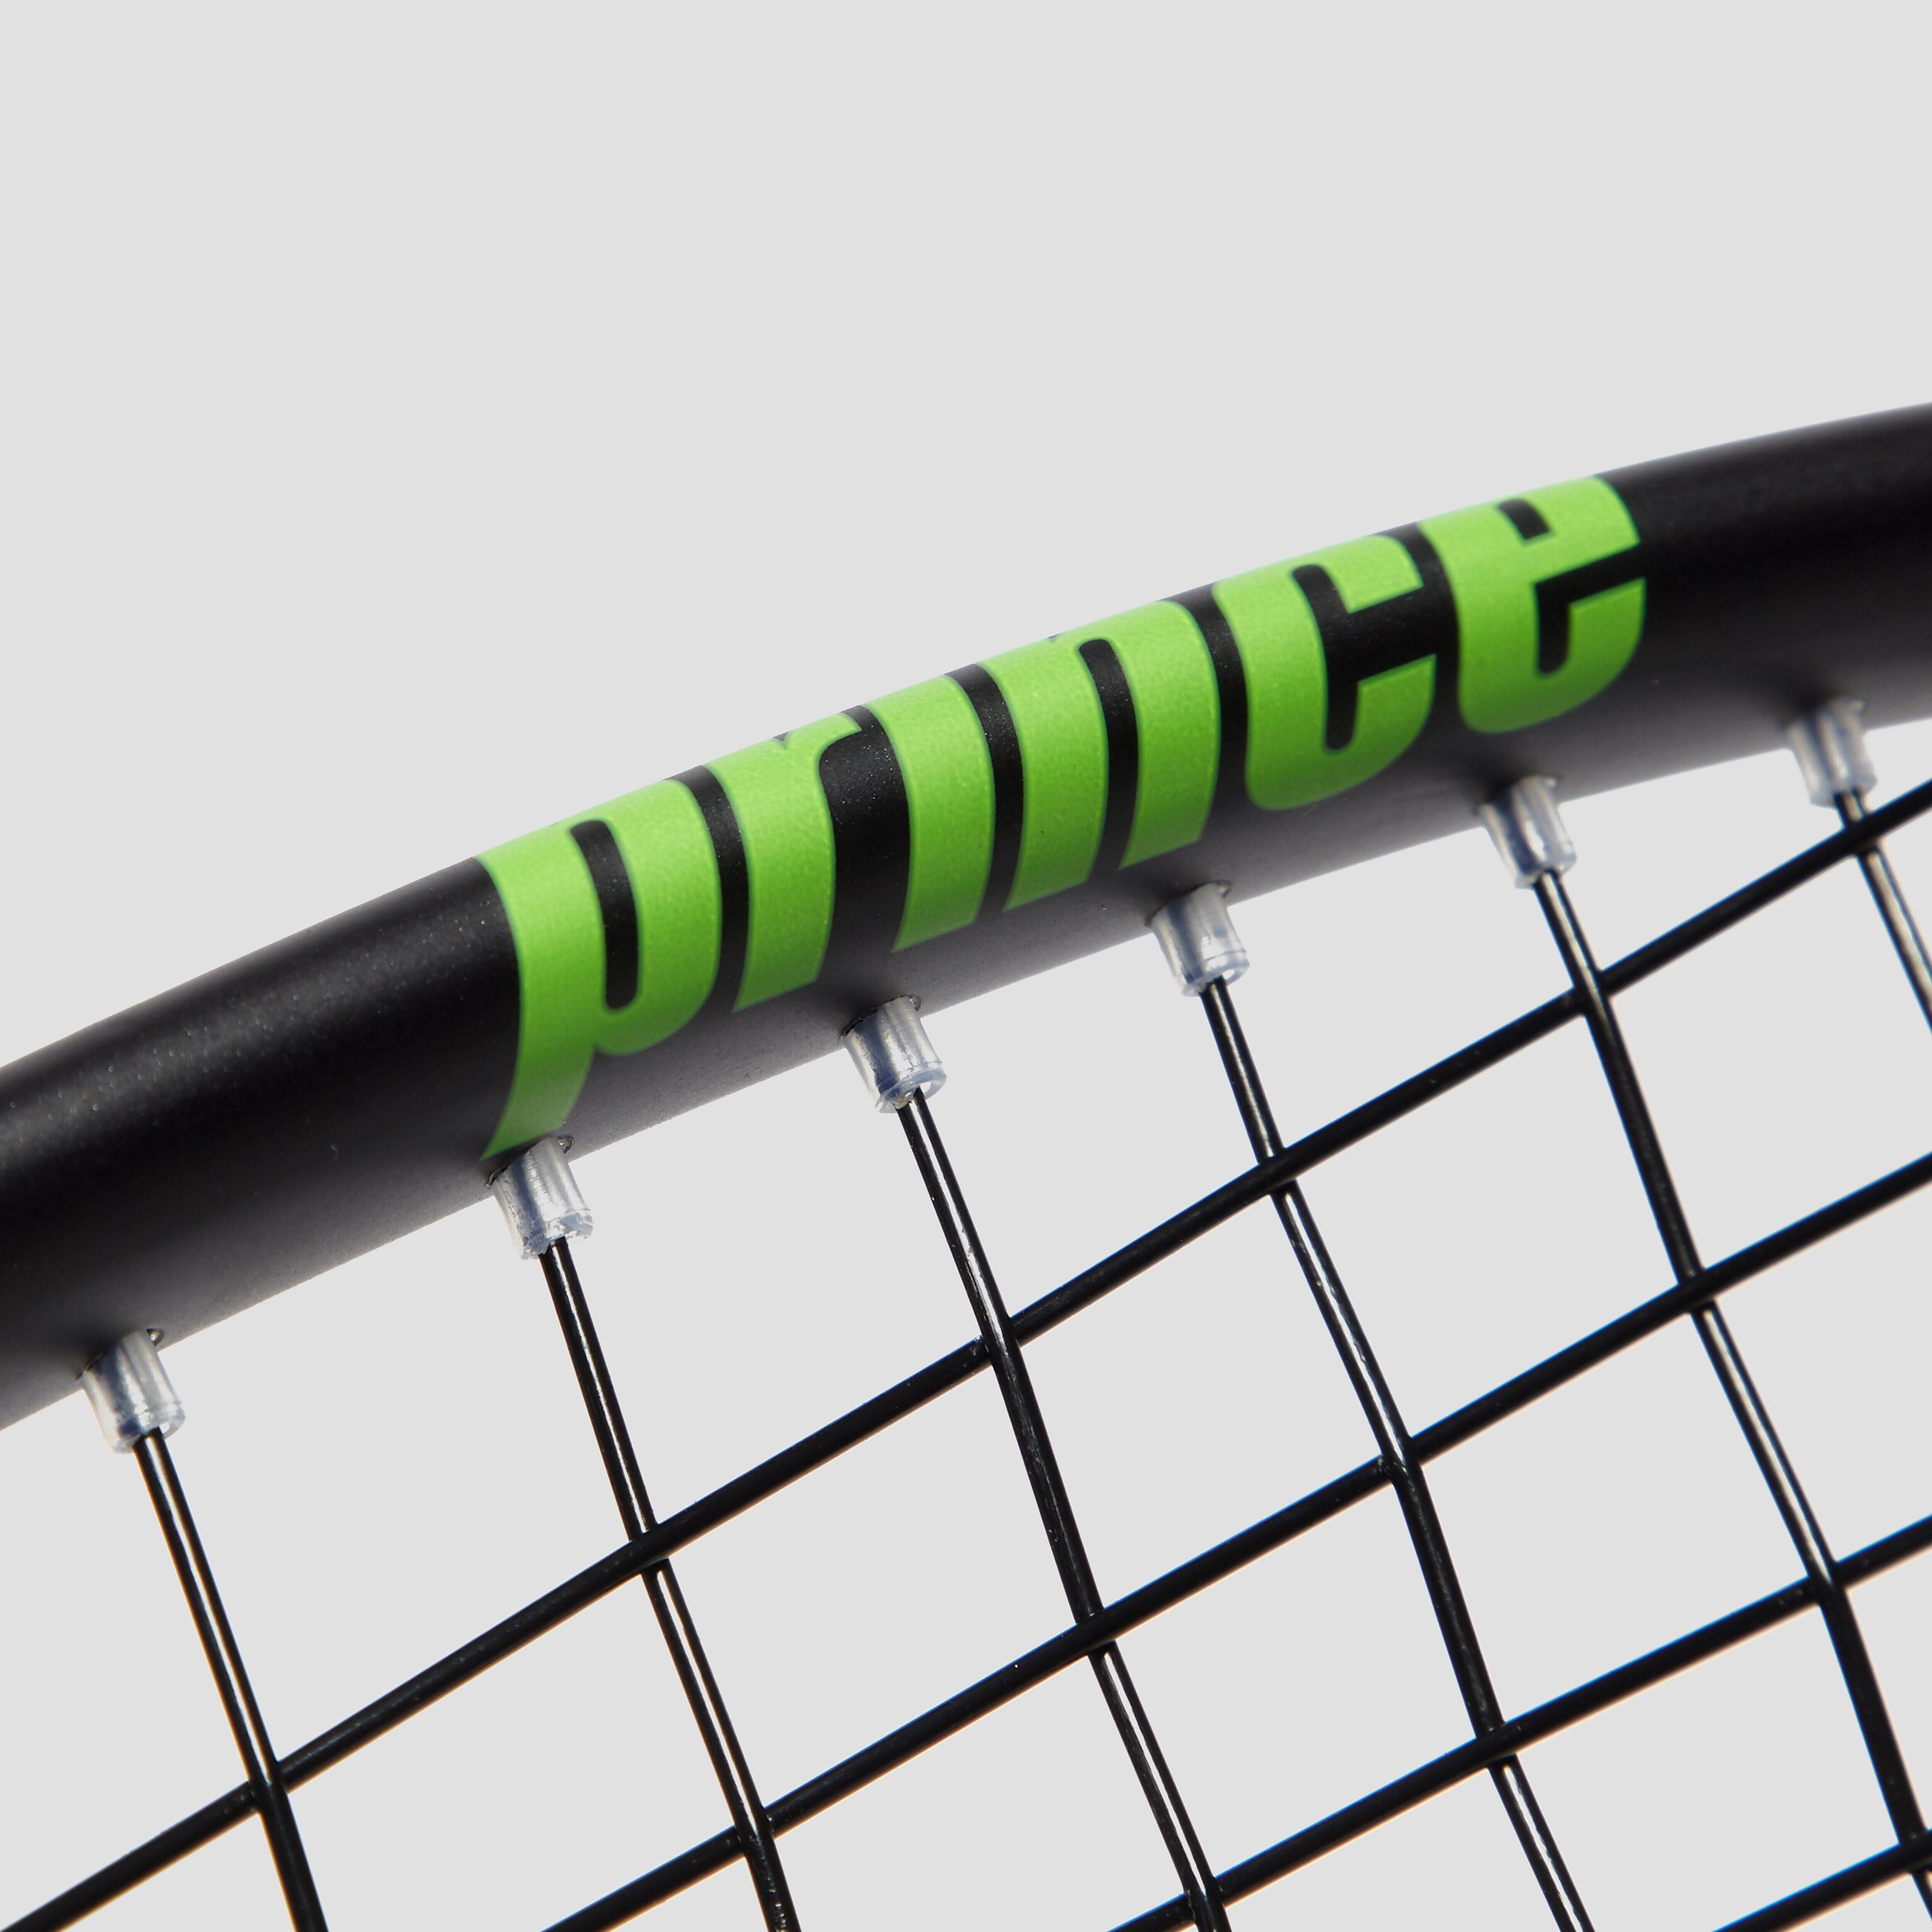 Prince Thunder Eclipse 400 Squash Racket